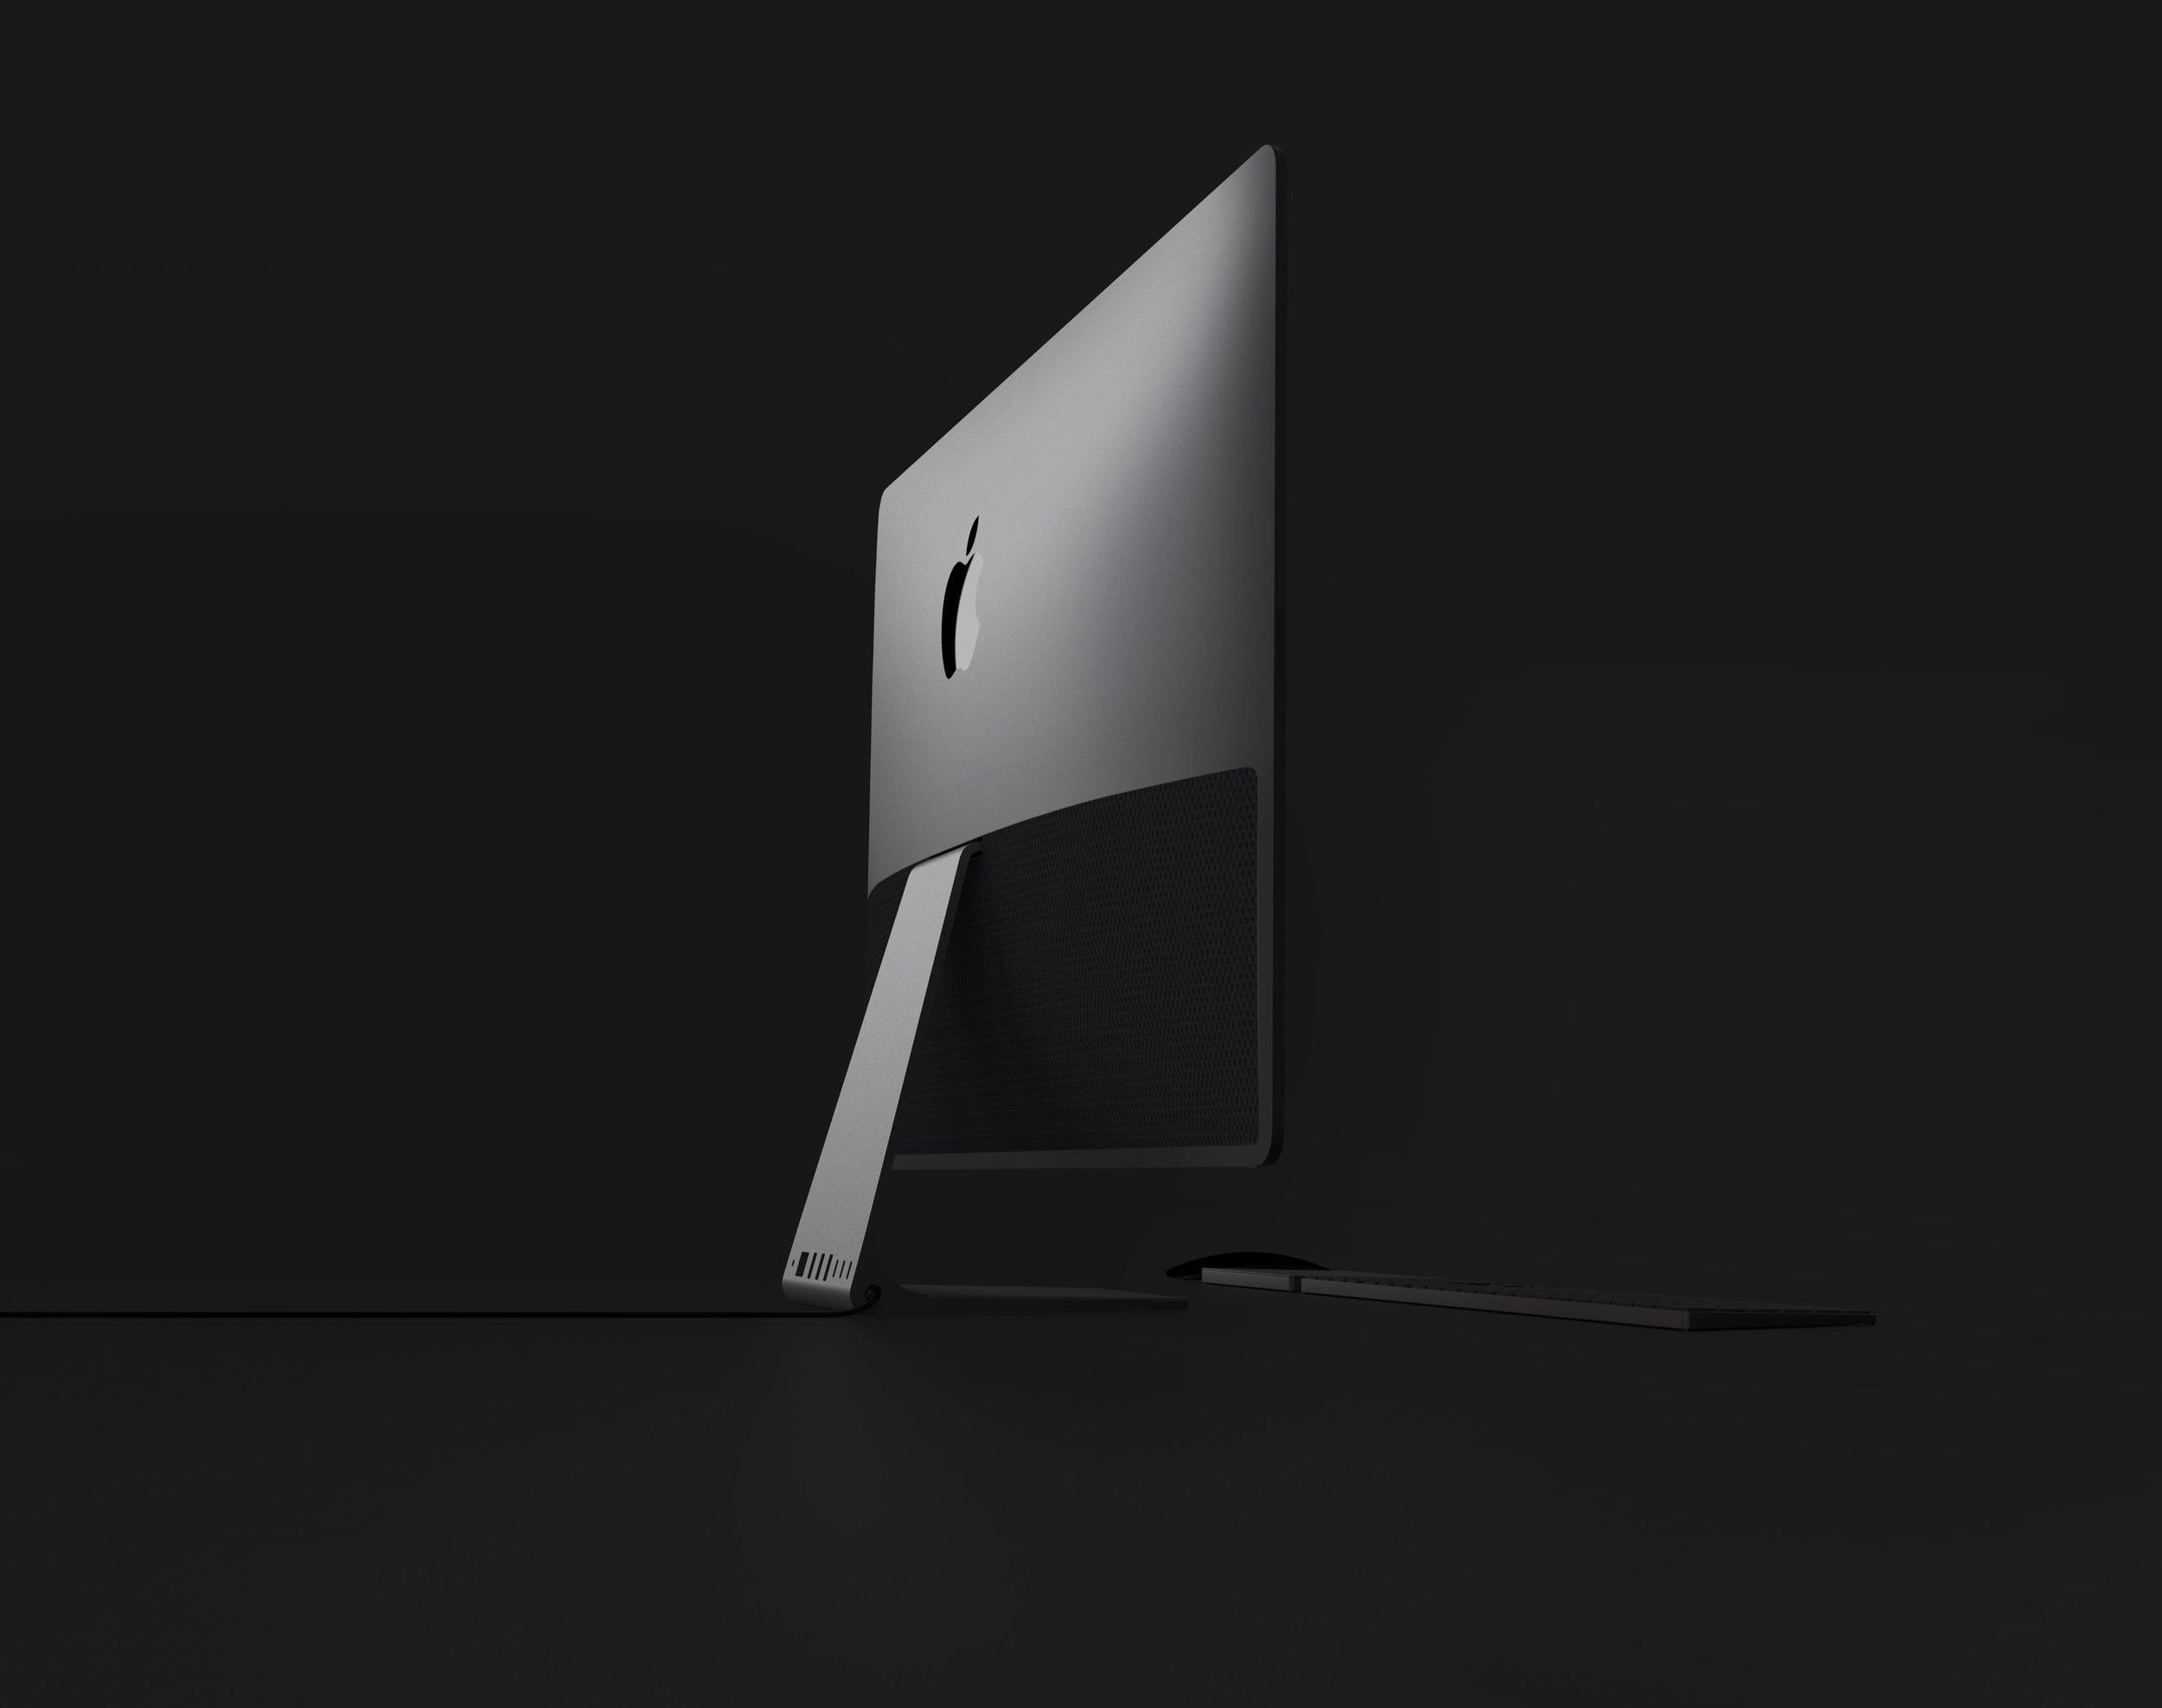 PMartin_iMac2019_Panel5@2x.jpg